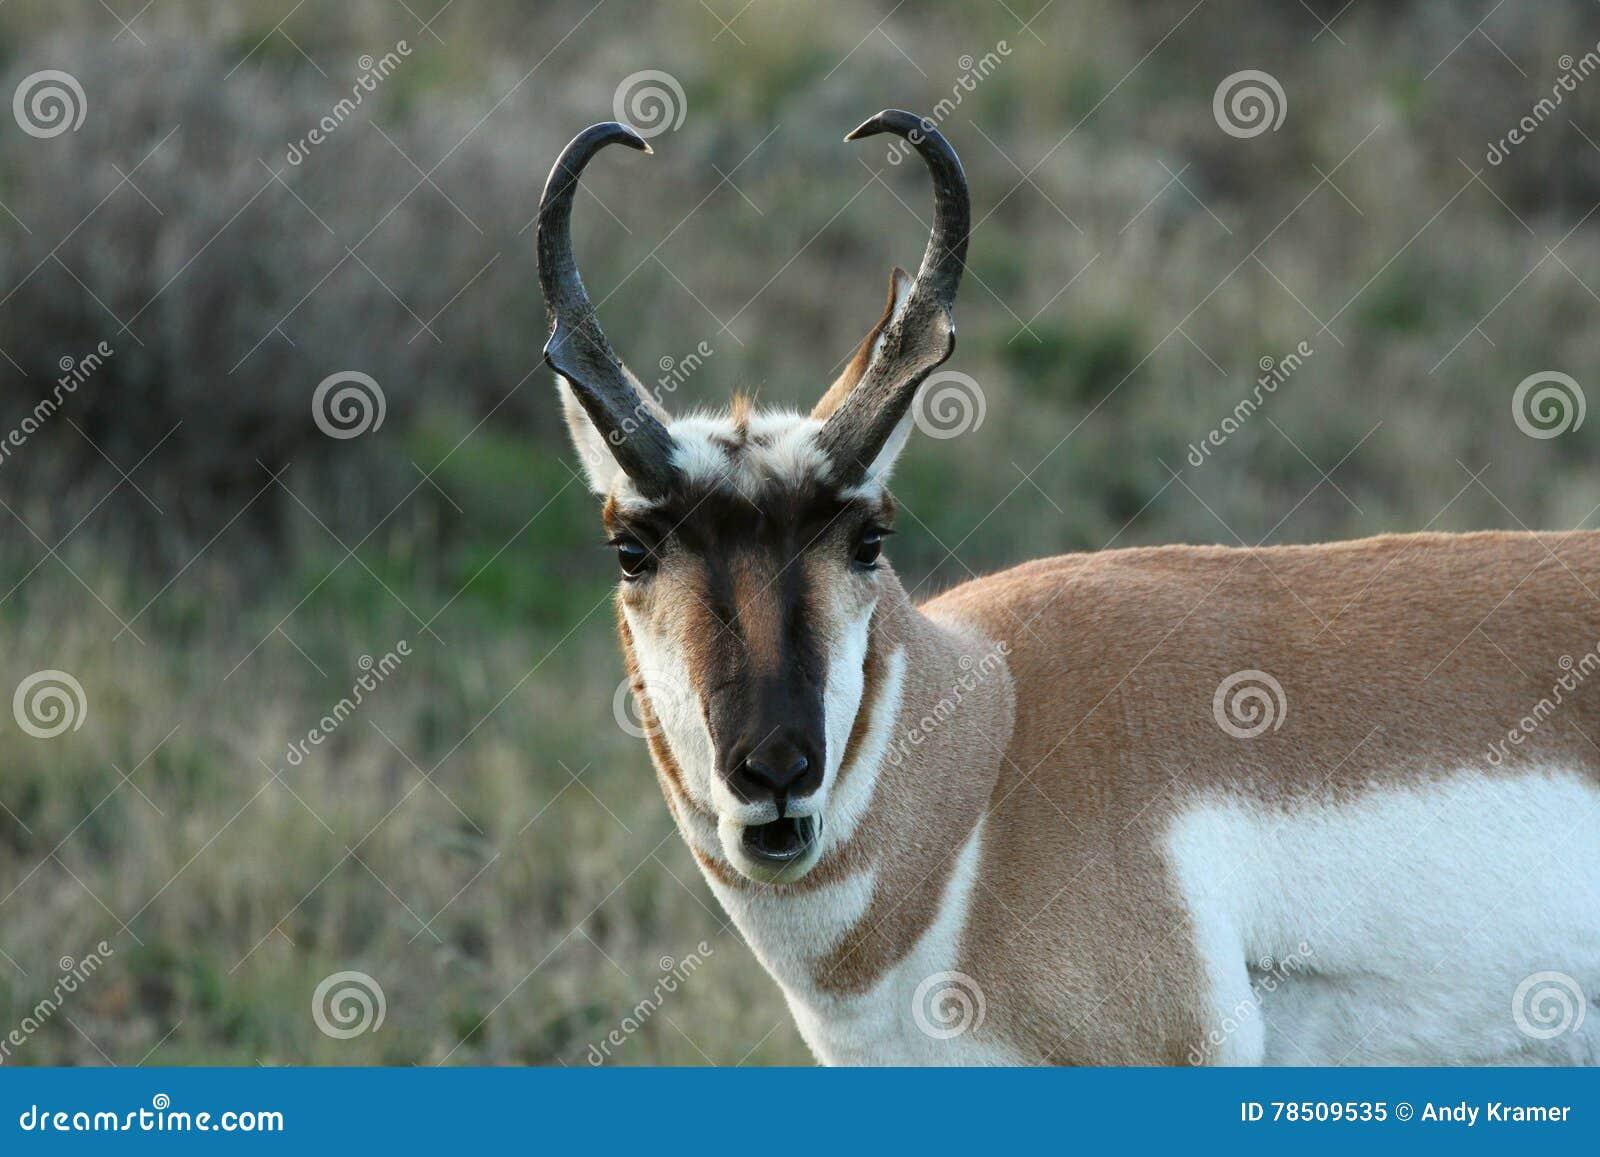 Antilope de Pronghorn au matin